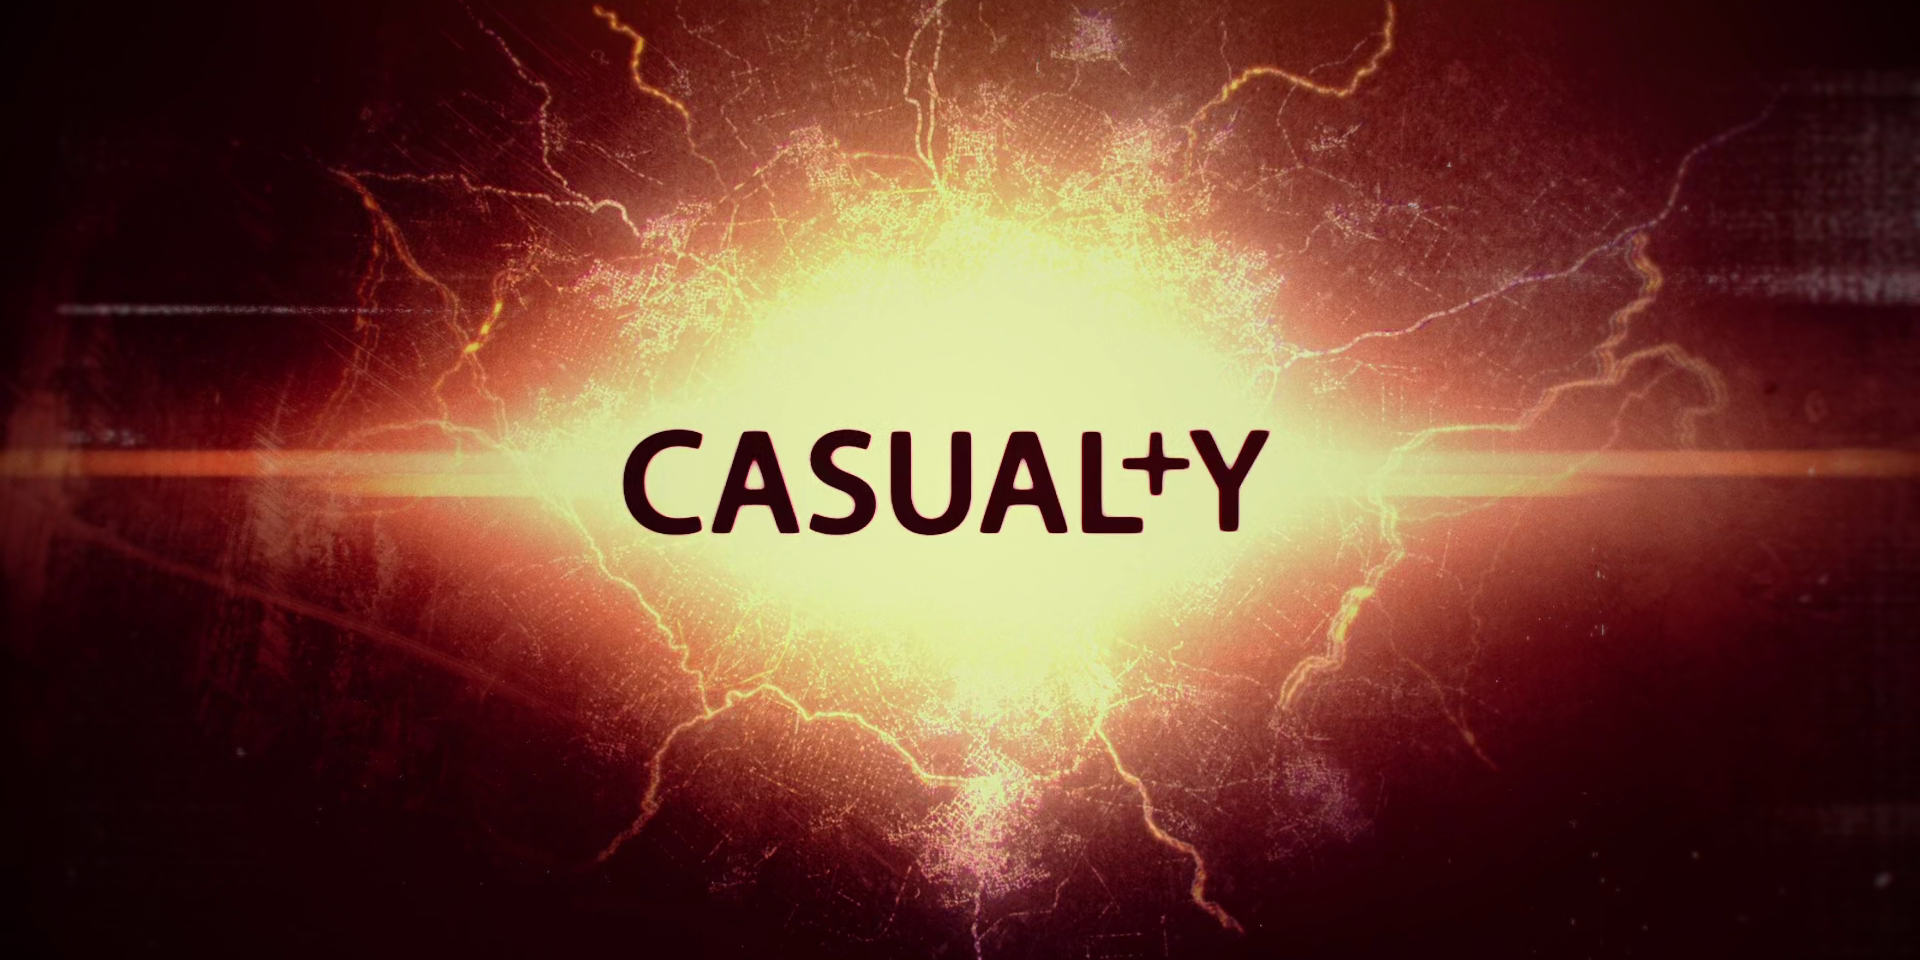 CasualtyPrevNextPlaceholder.png